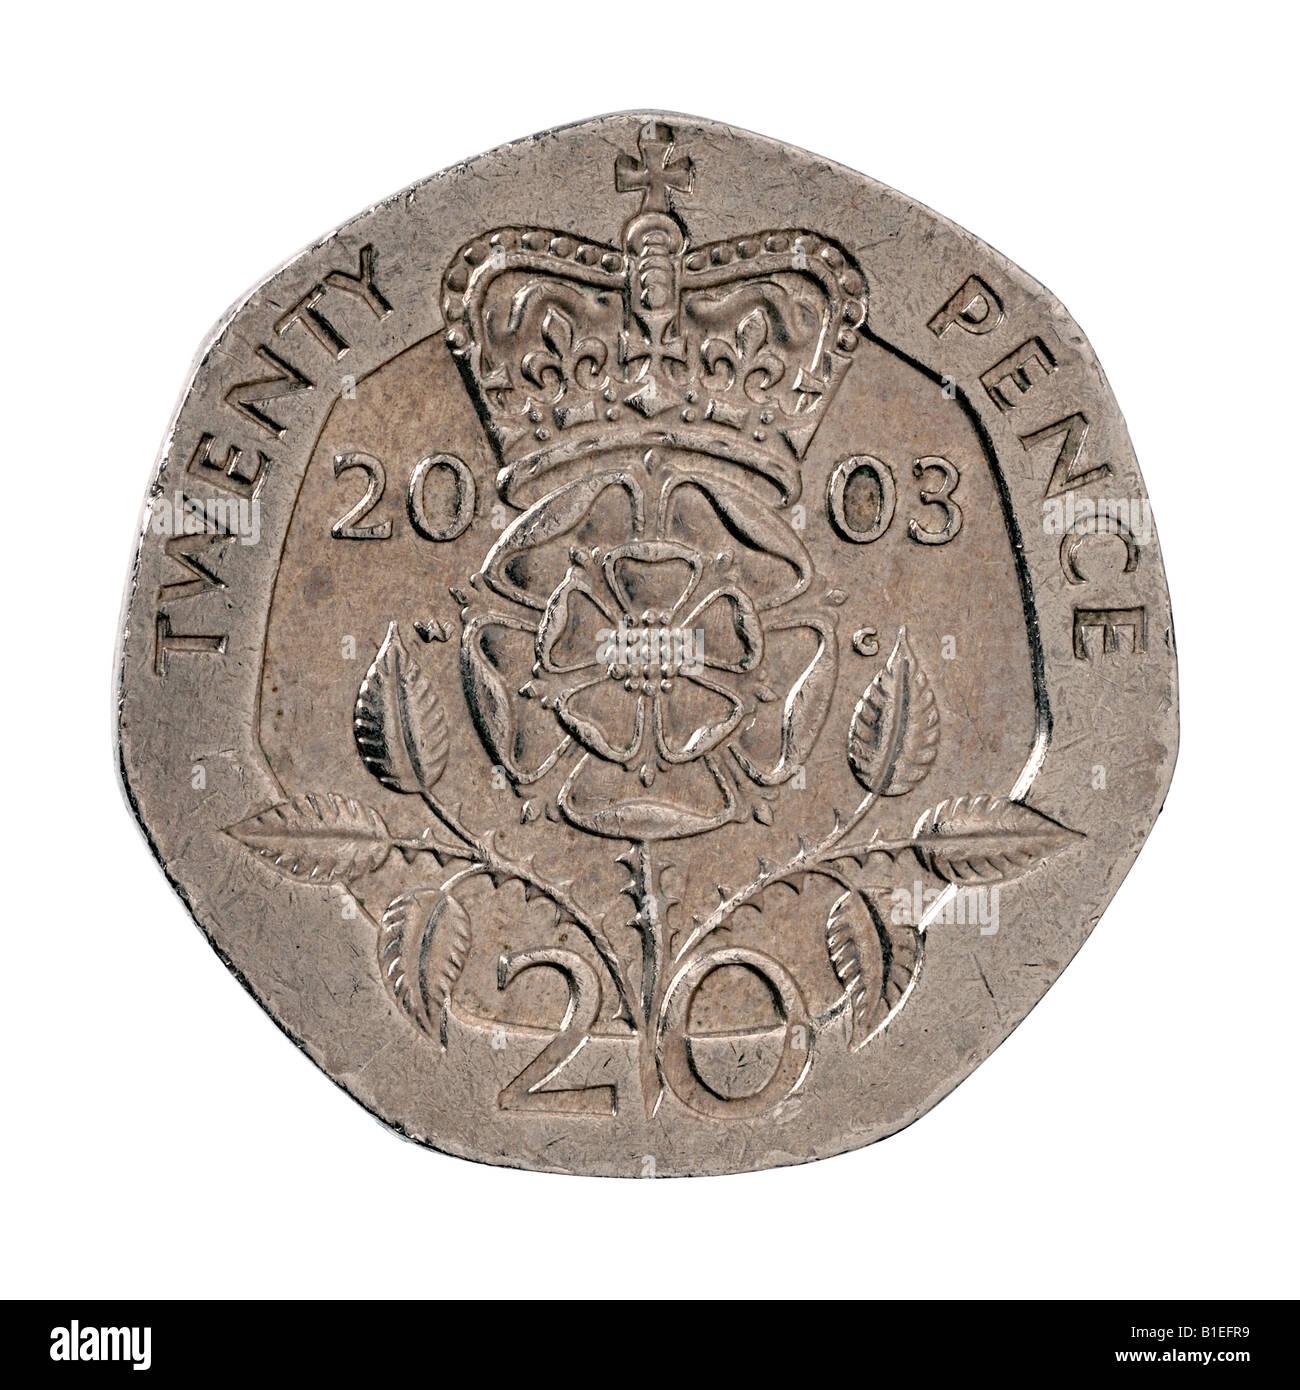 20 Pence Sterling Münze Stockfoto Bild 18144765 Alamy